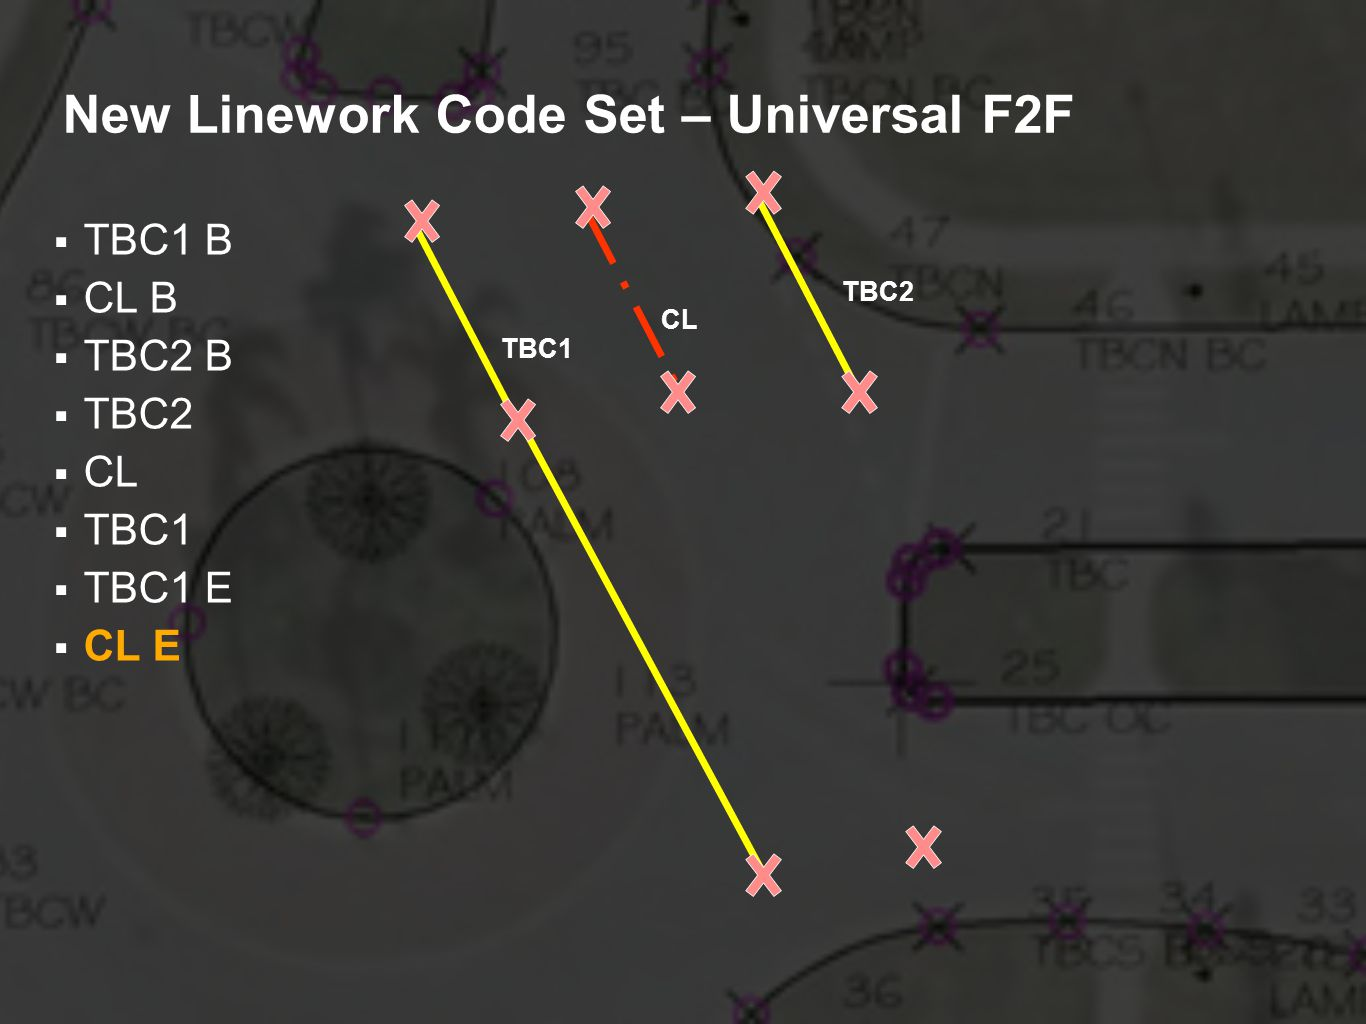 New Linework Code Set – Universal F2F